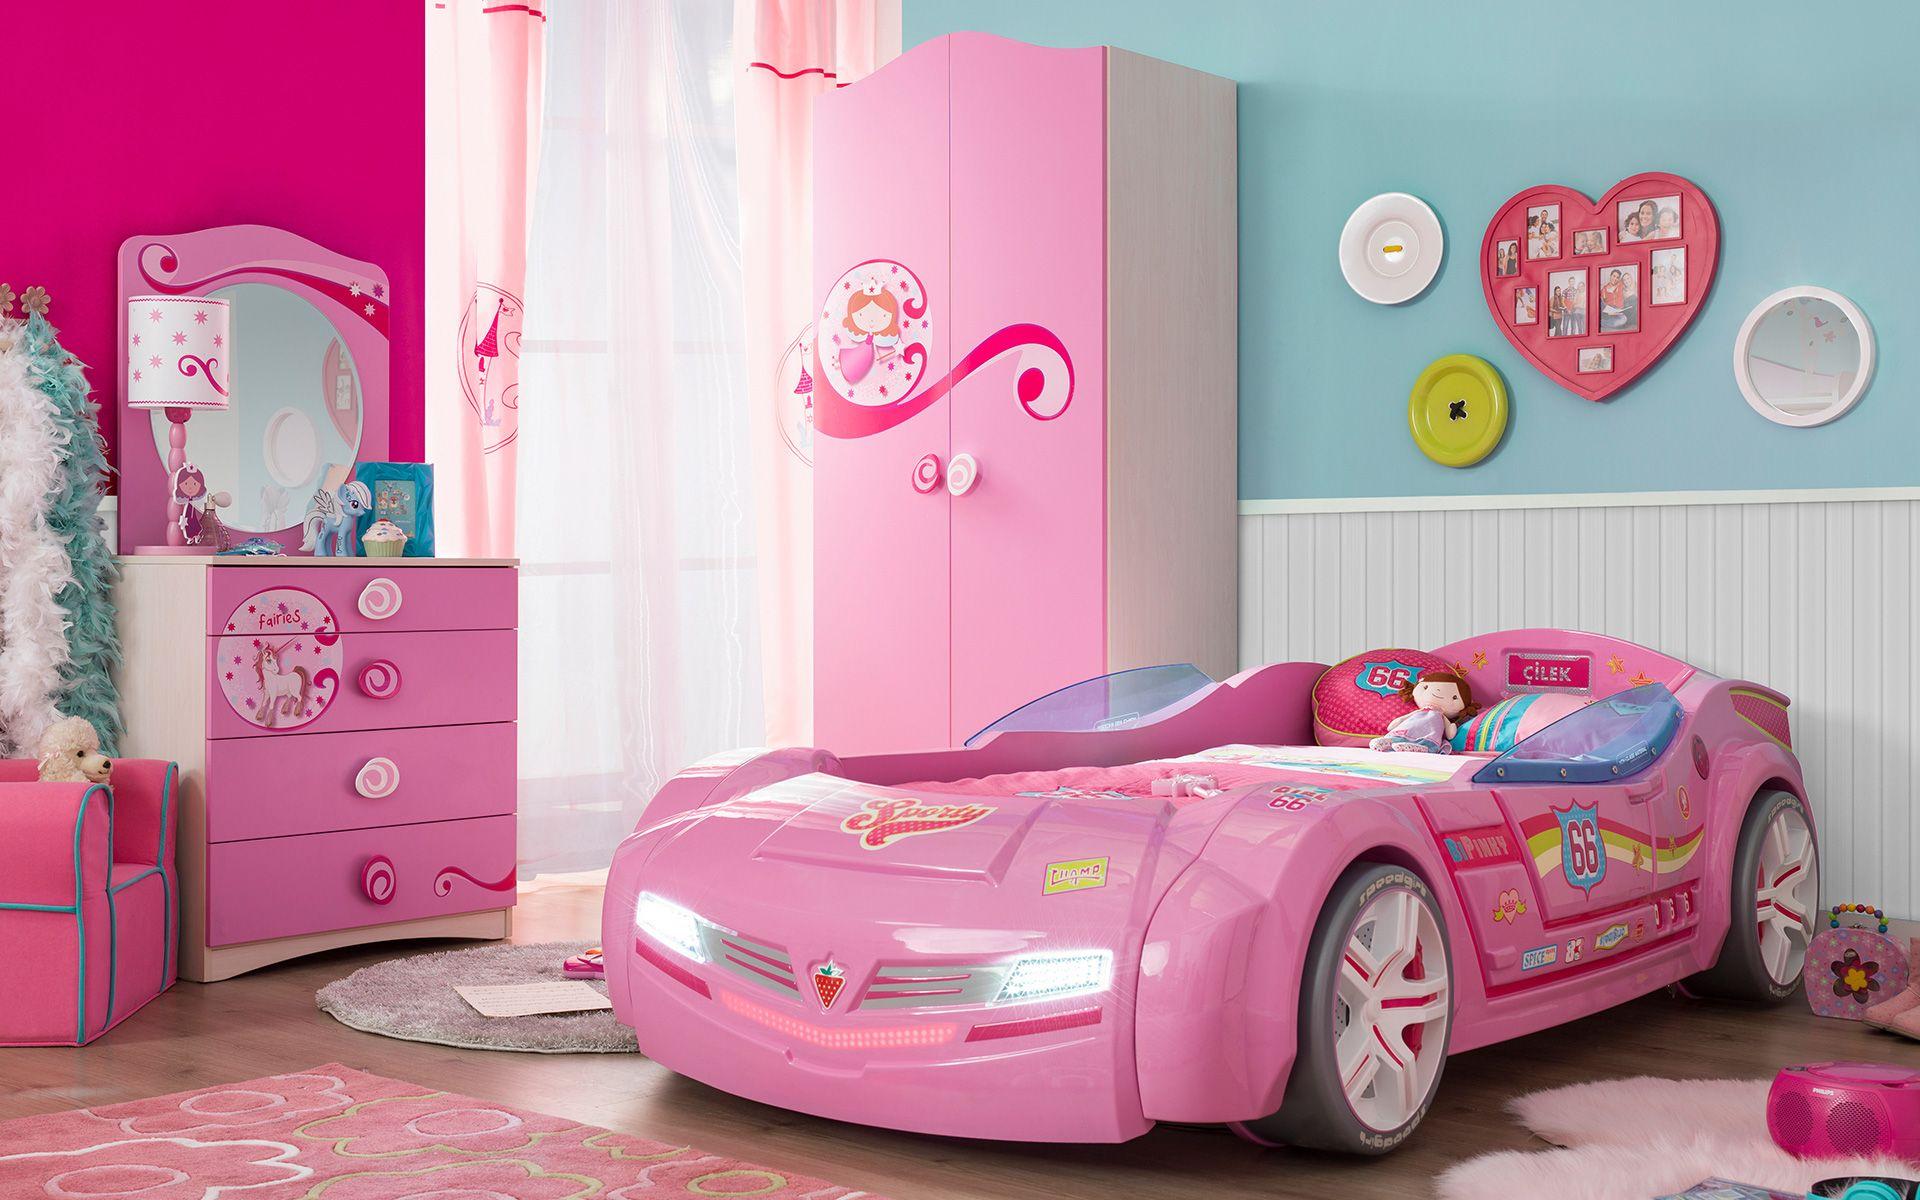 Pink Car Bed BiConcept Series Kız odaları, Kız çocuğu